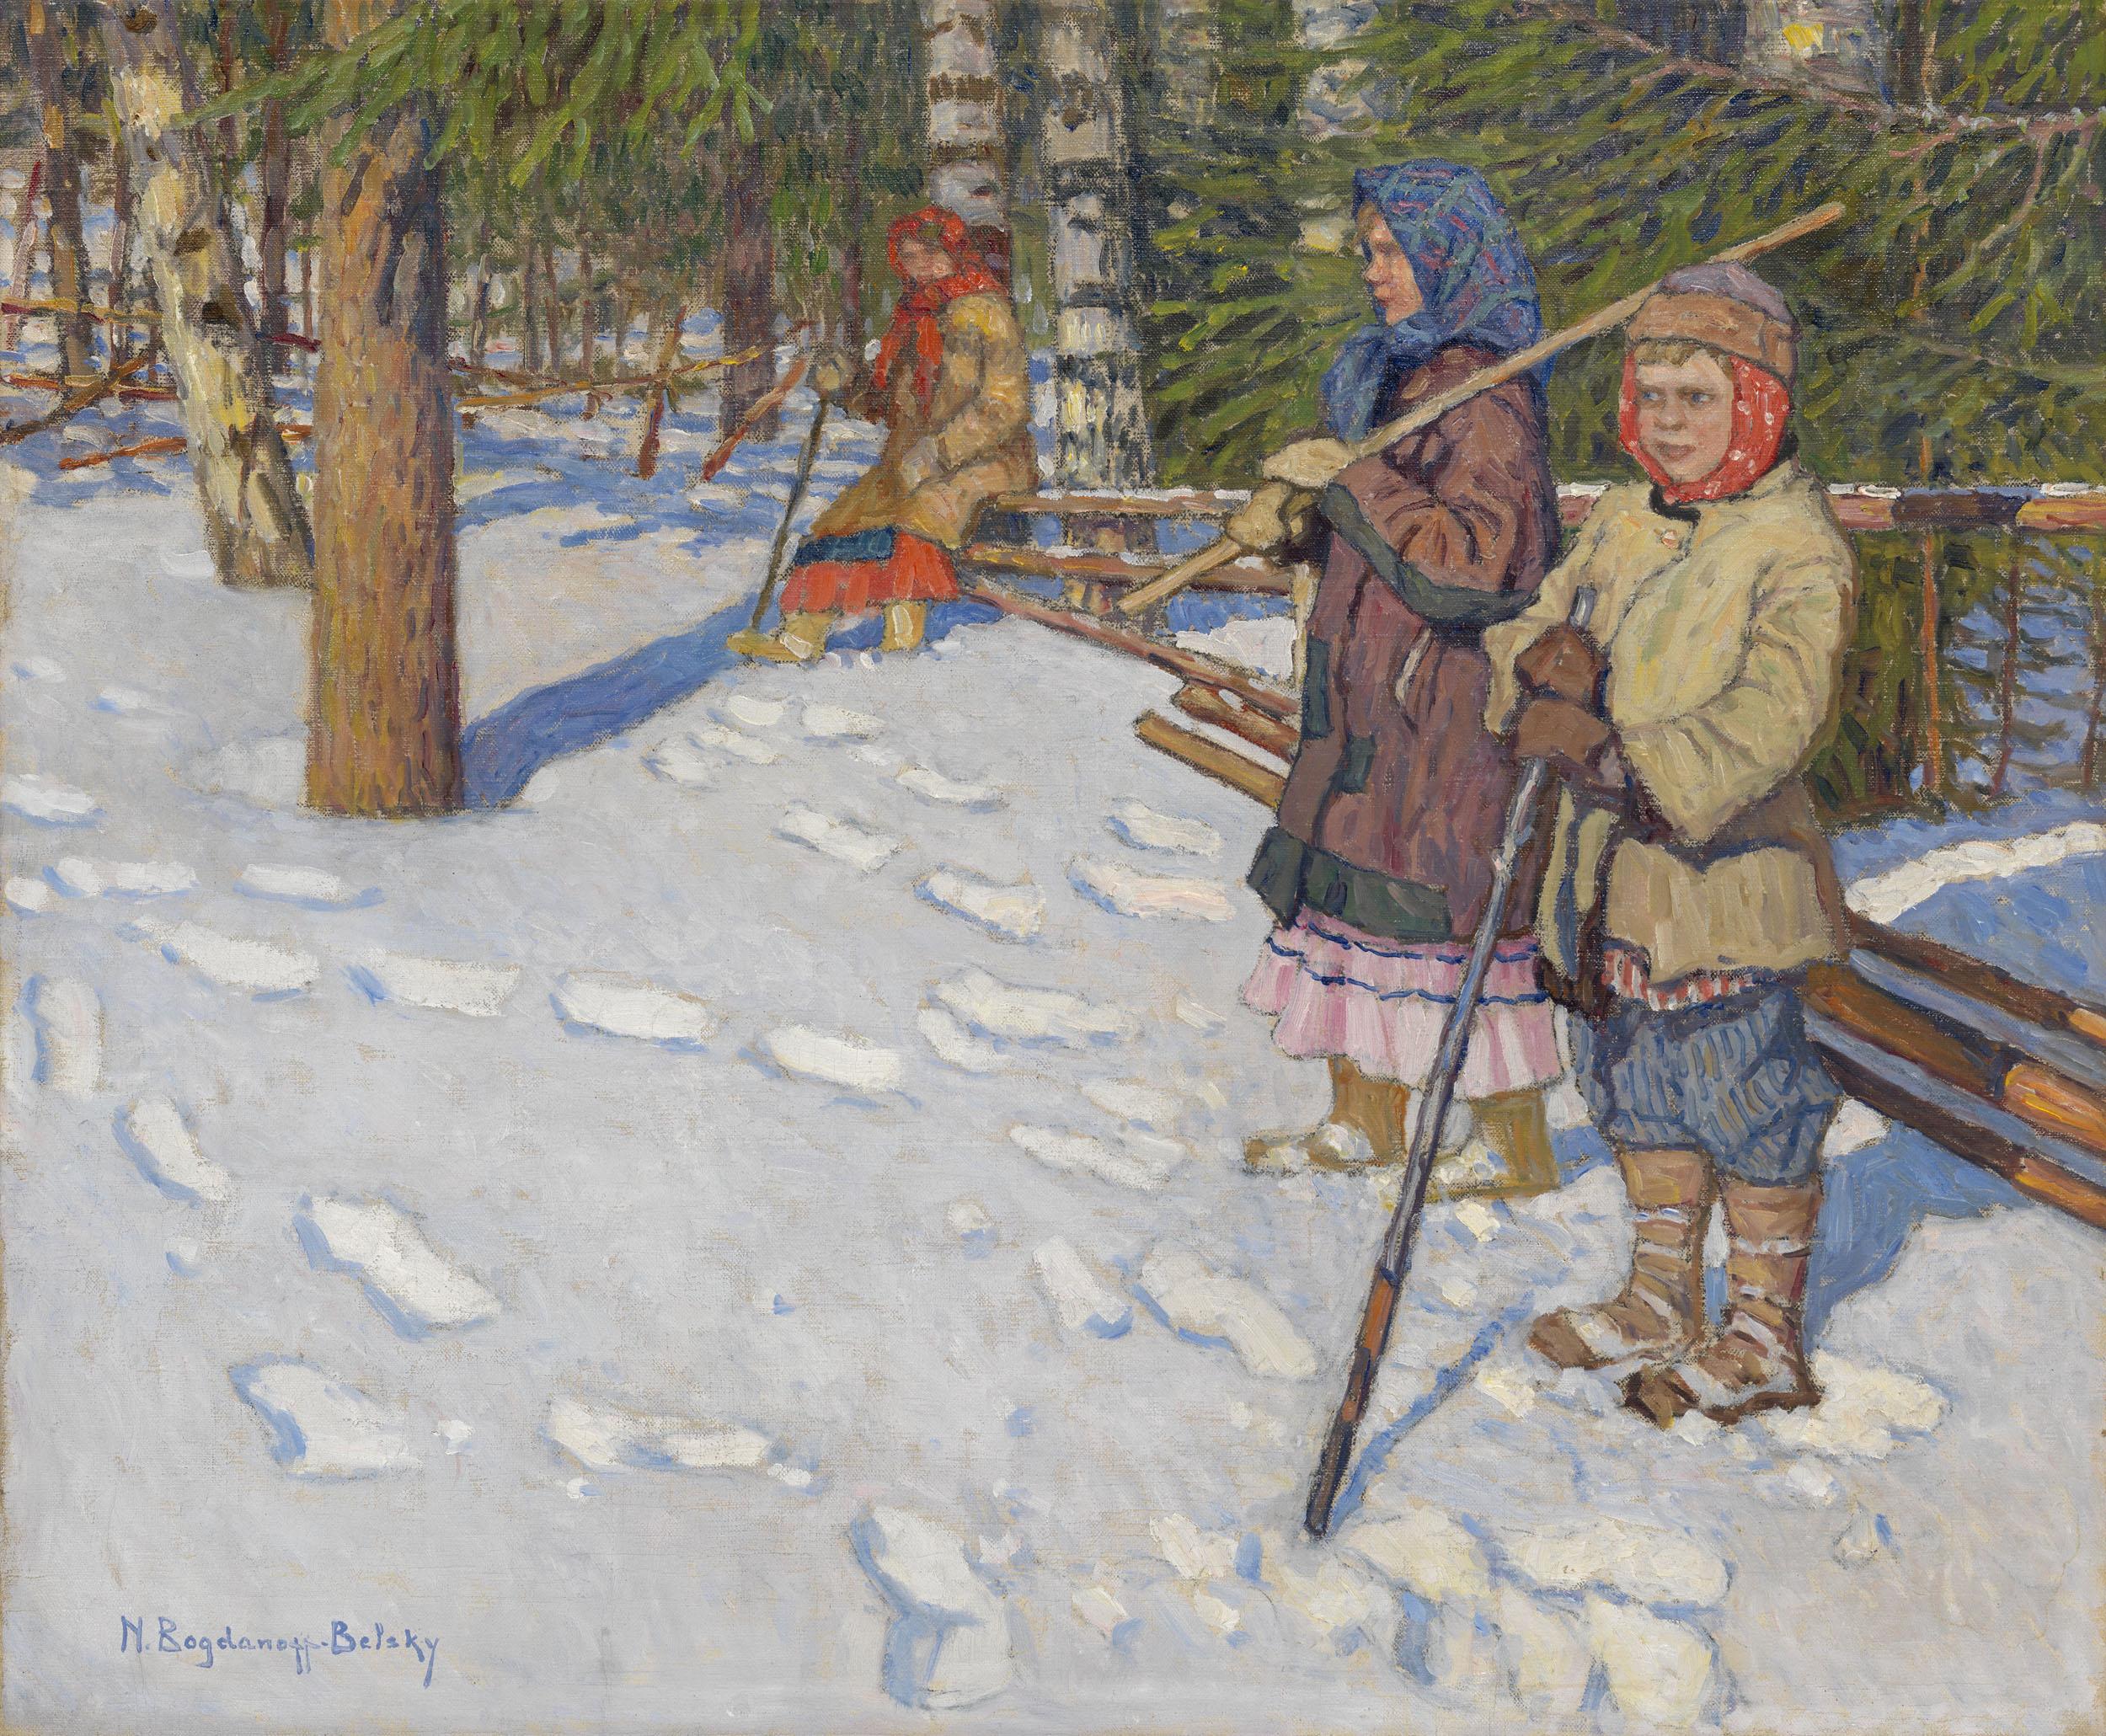 BOGDANOV-BELSKY, NIKOLAI Children in a Wintry Forest